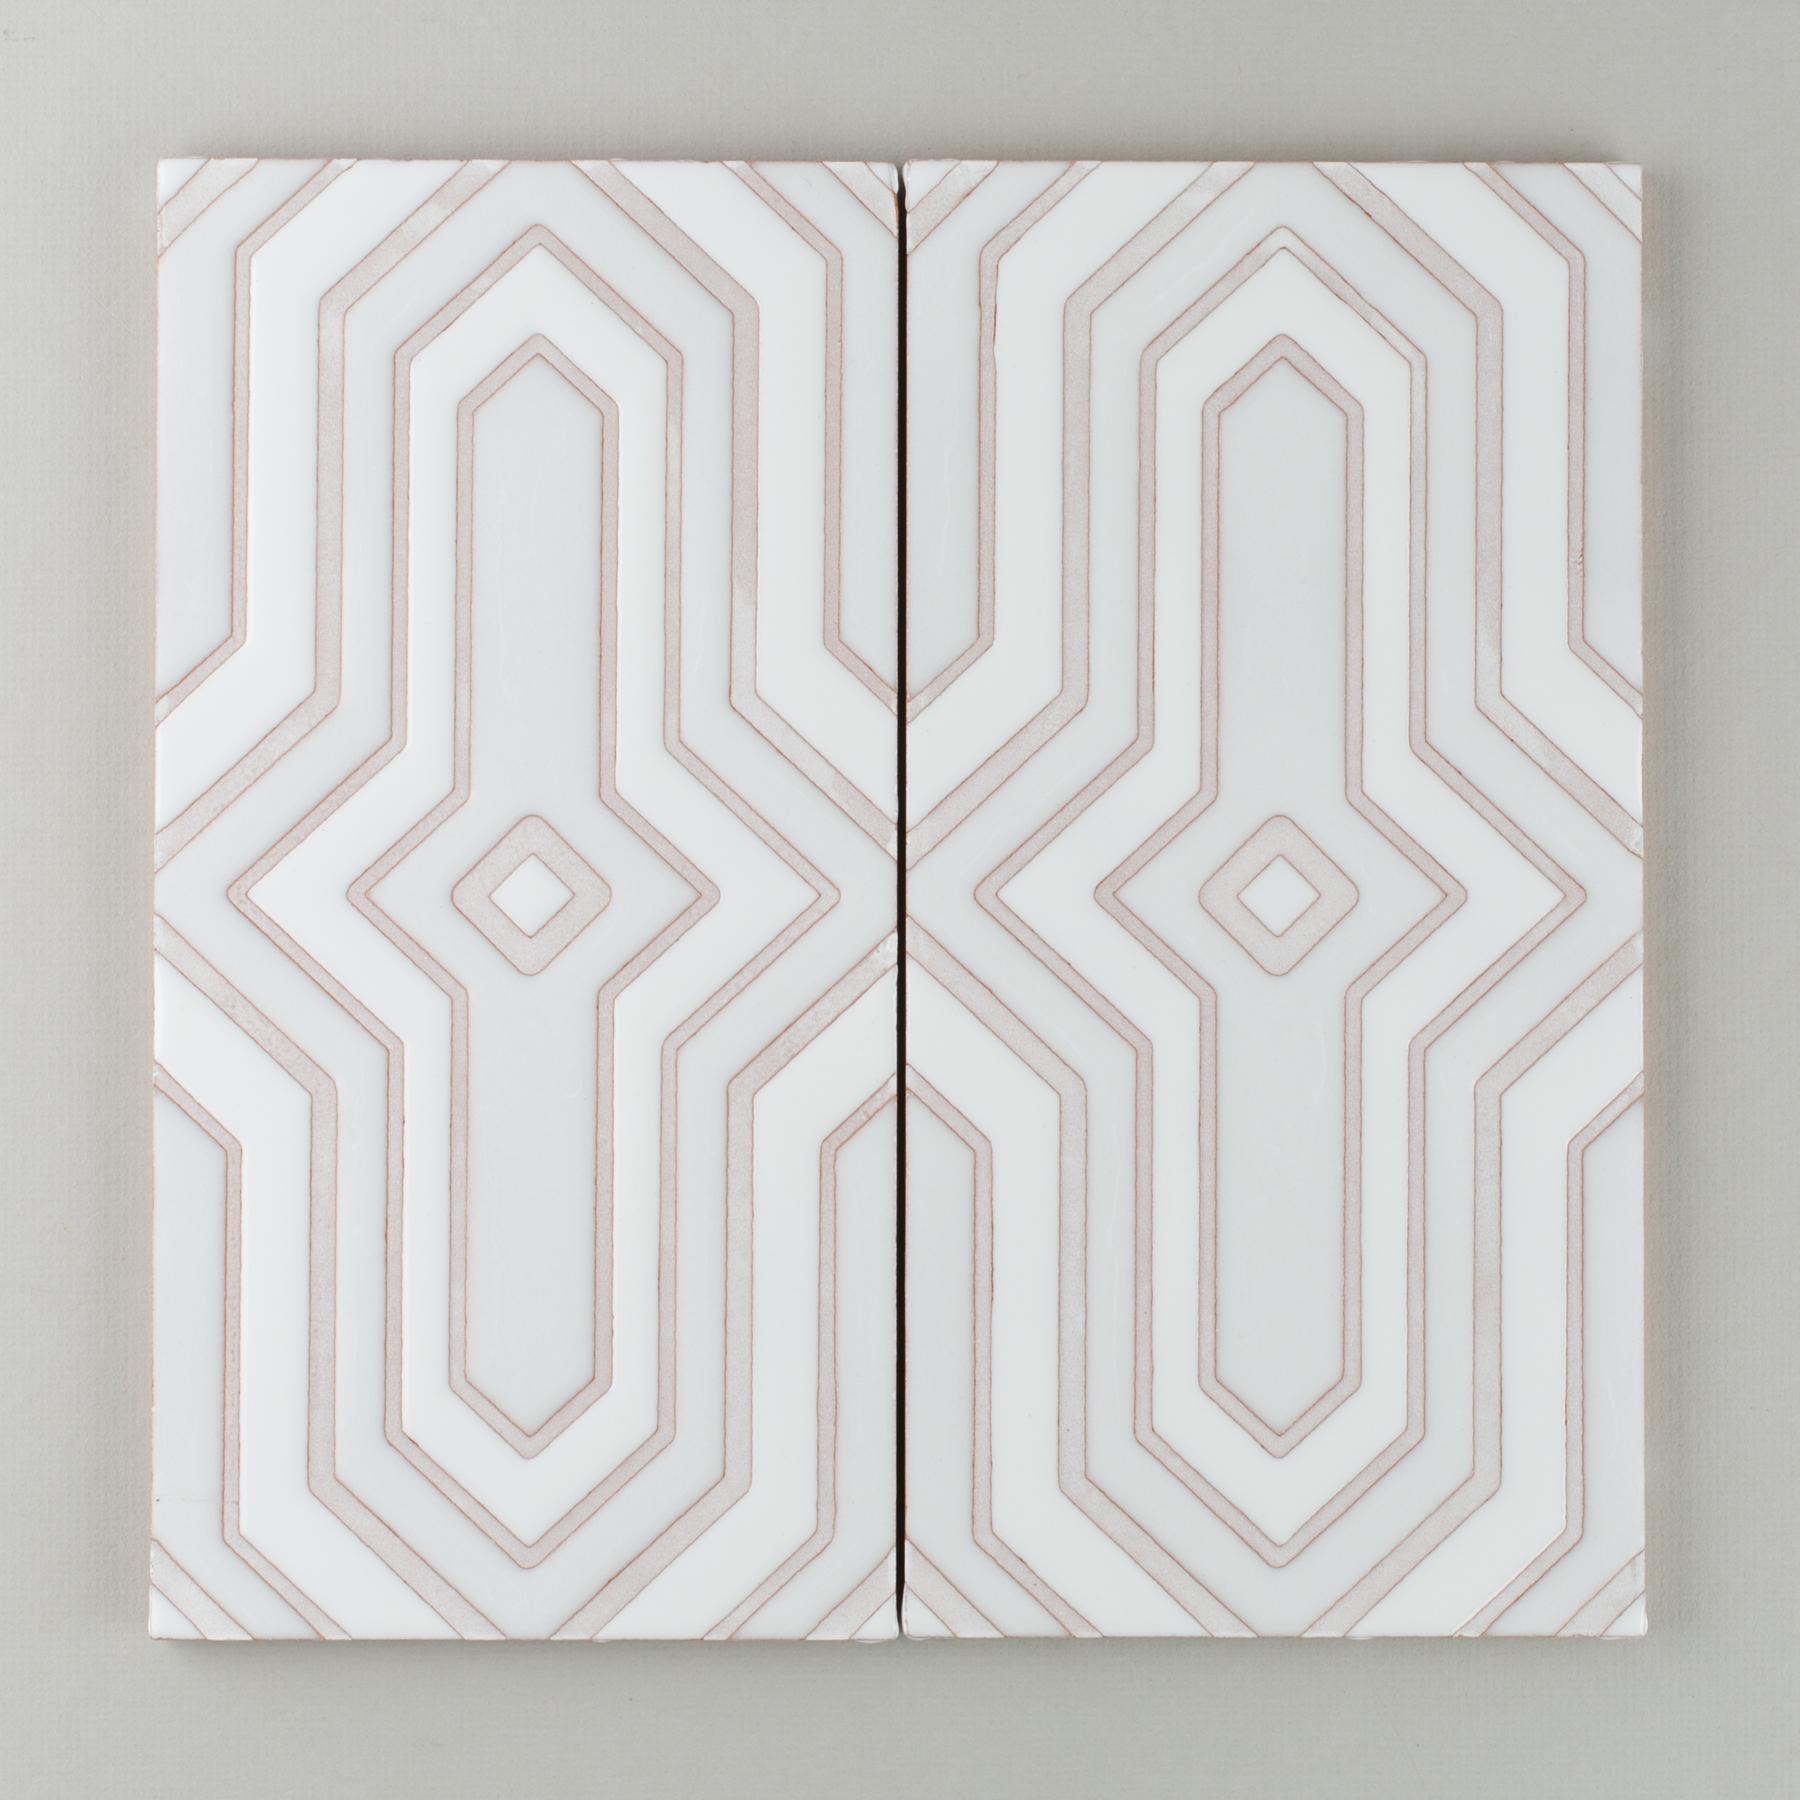 Fireclay Tile Fireclay Tile